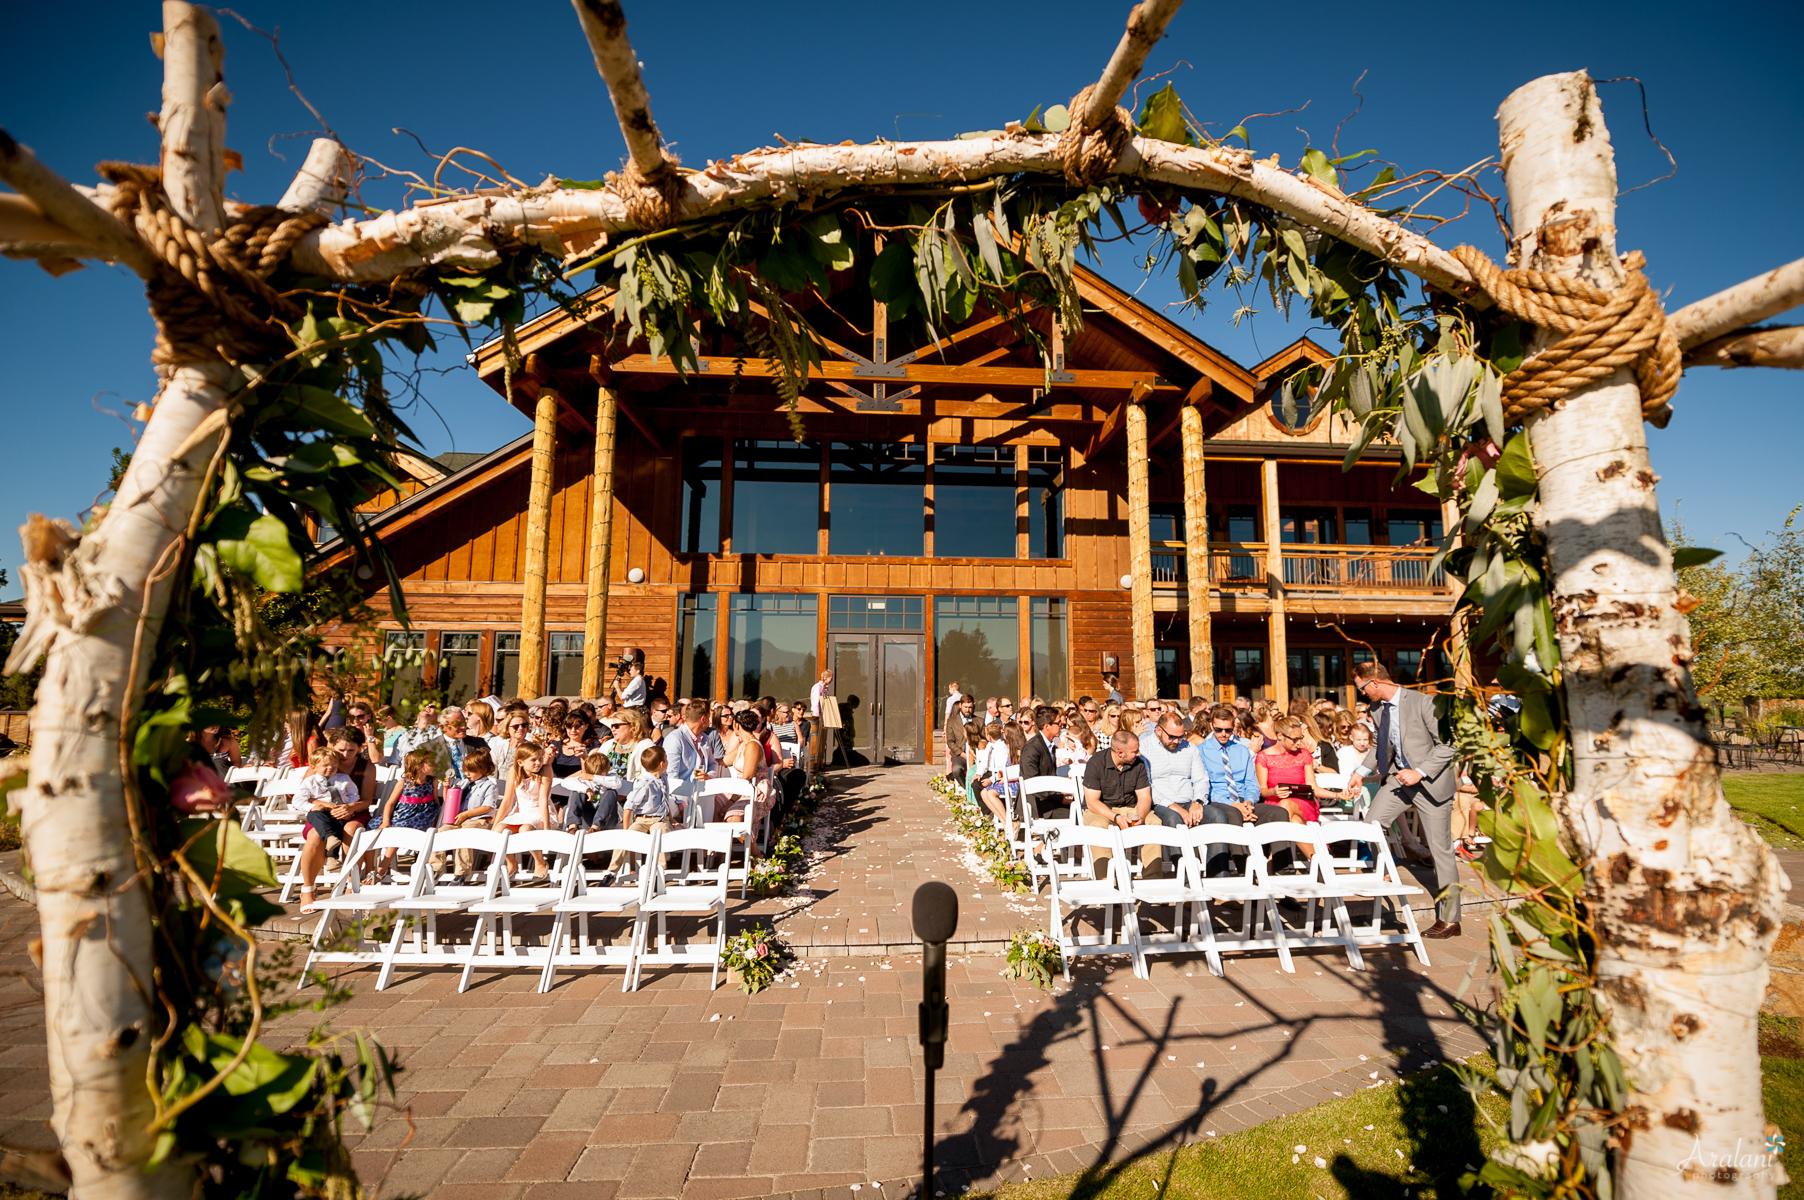 Aspen_Lakes_Golf_Course_Wedding_KG0017.jpg